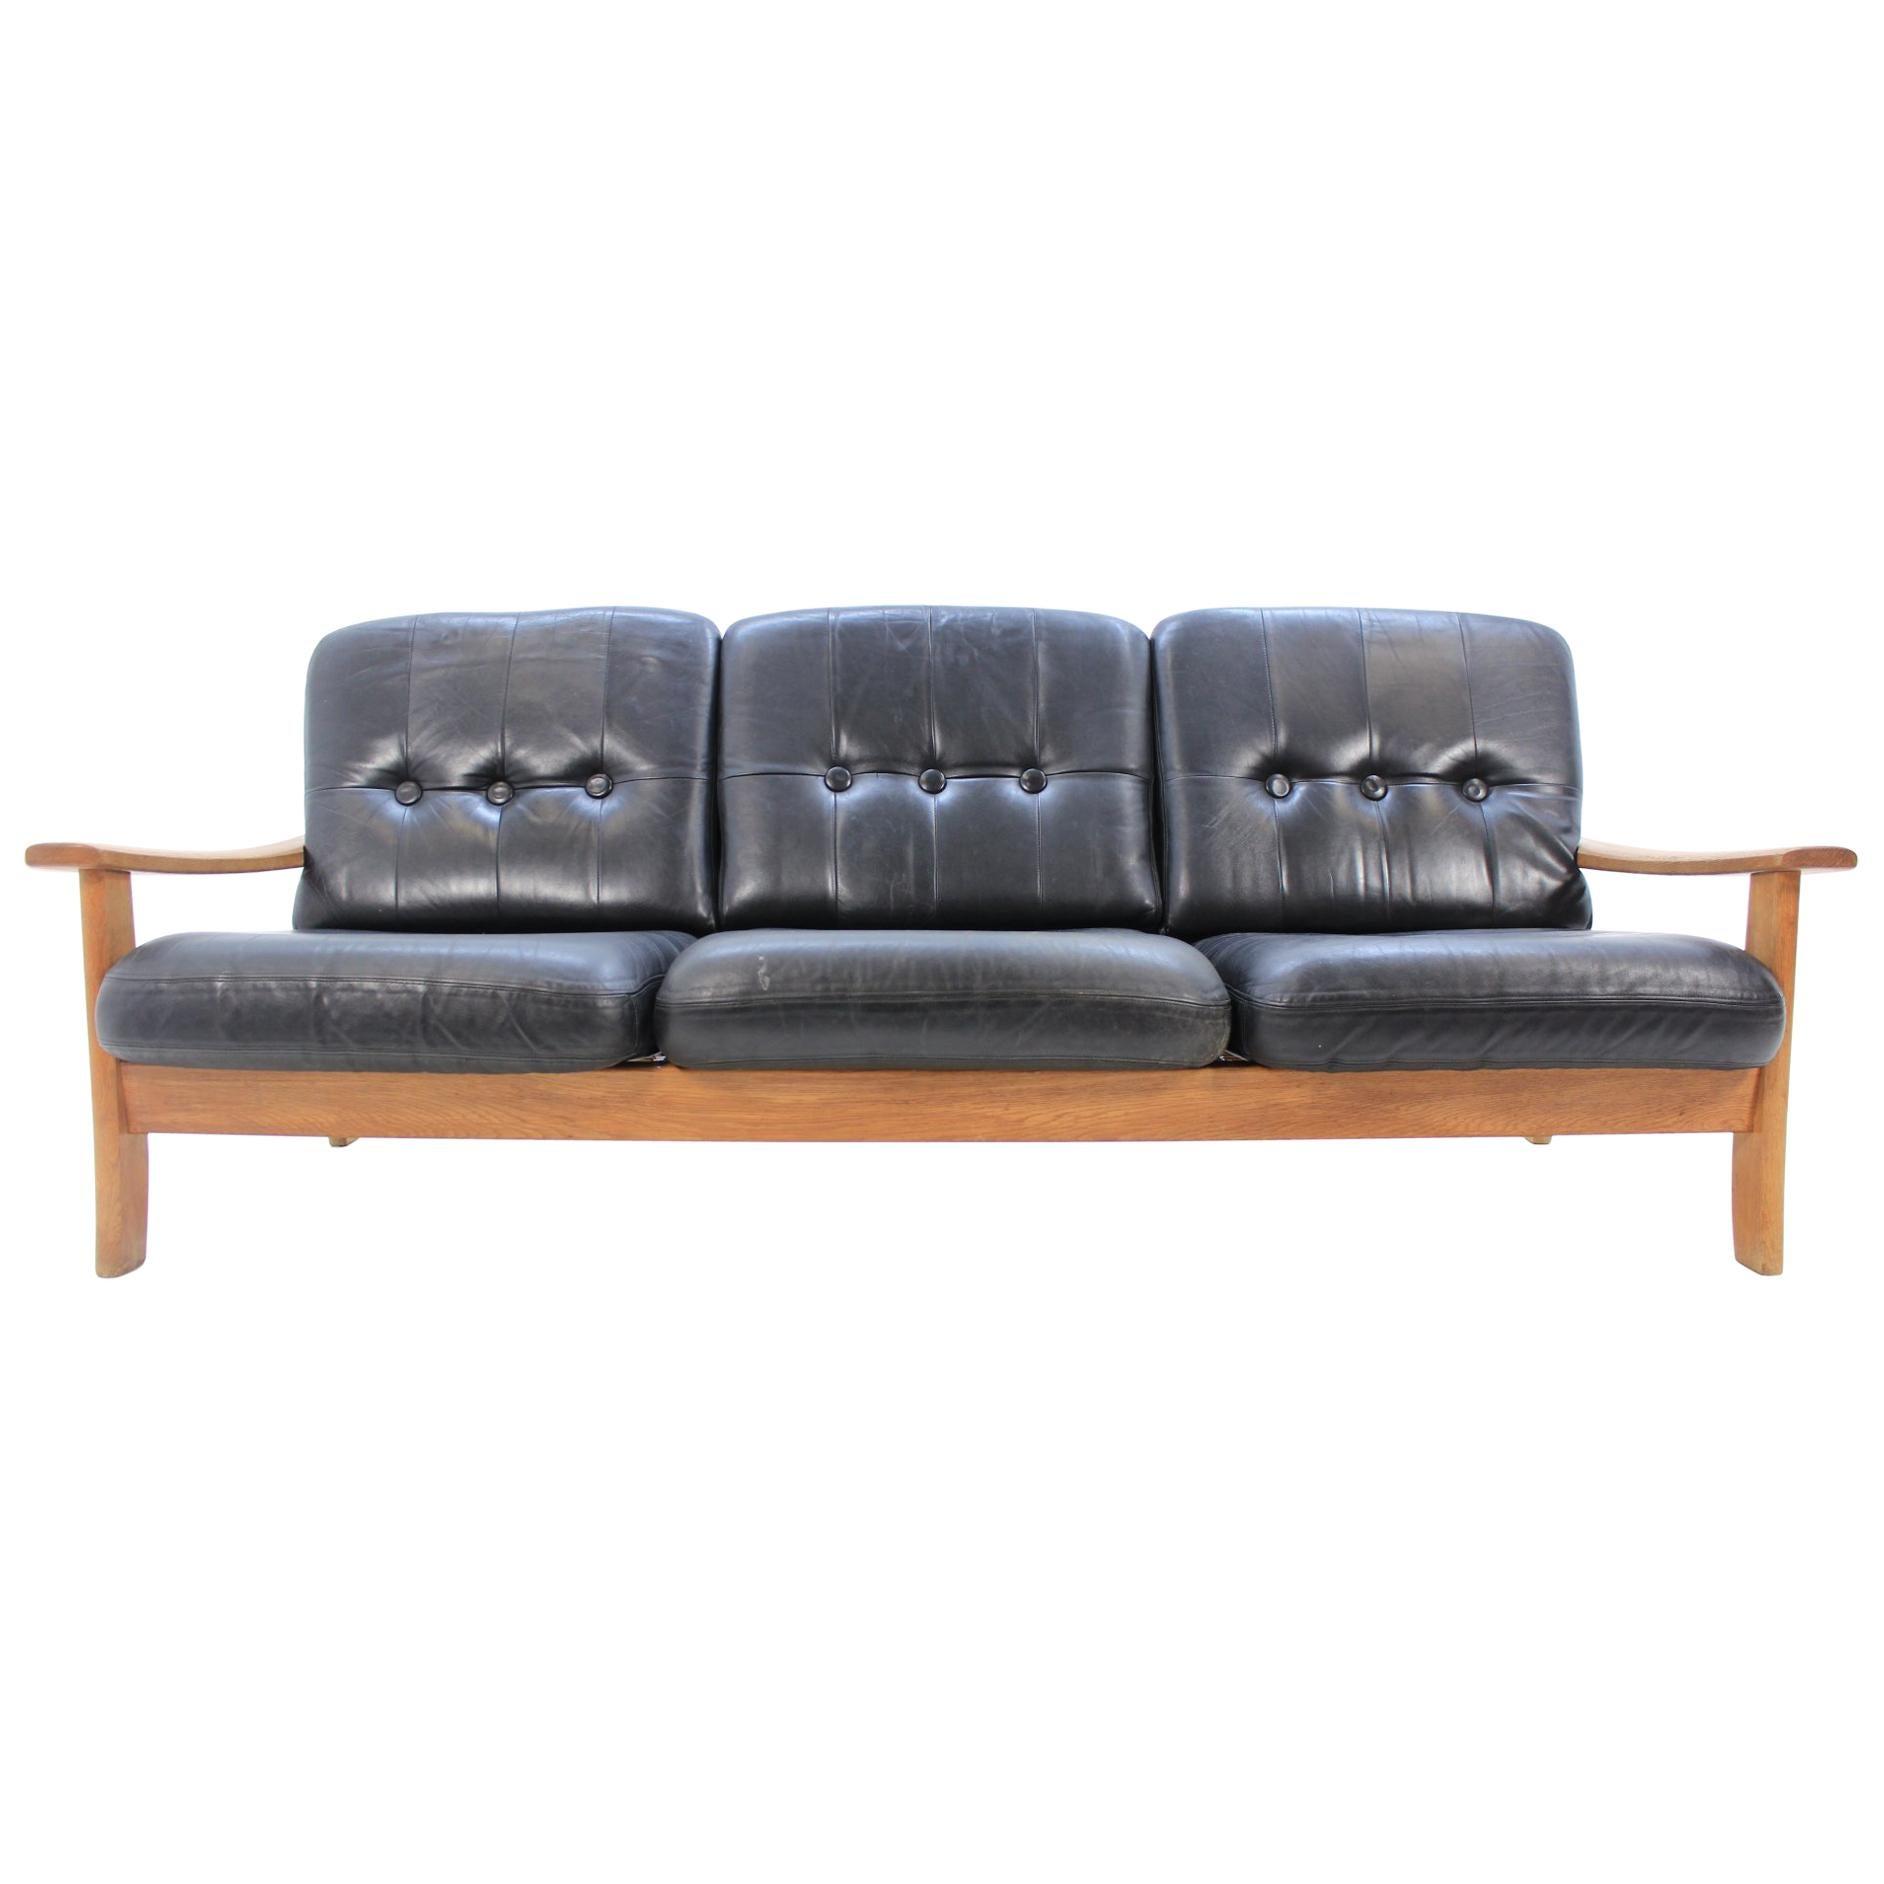 Midcentury Scandinavian Leather Sofa, 1960s bei 1stdibs